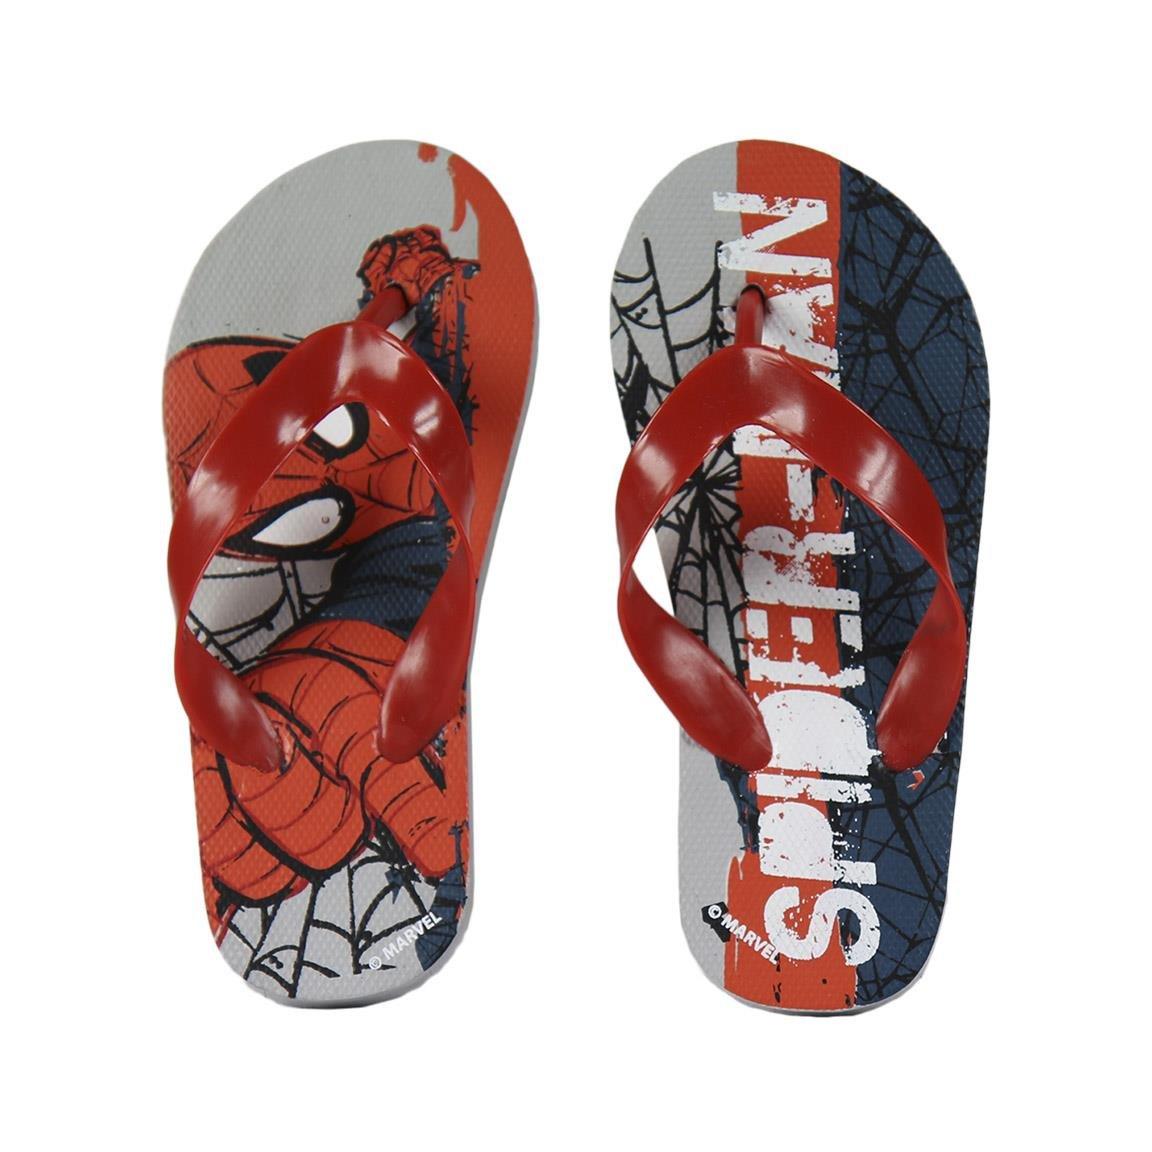 Gomma Bambino Marvel Spiderman 2300-2370 Sandali A Punta Aperta Infradito